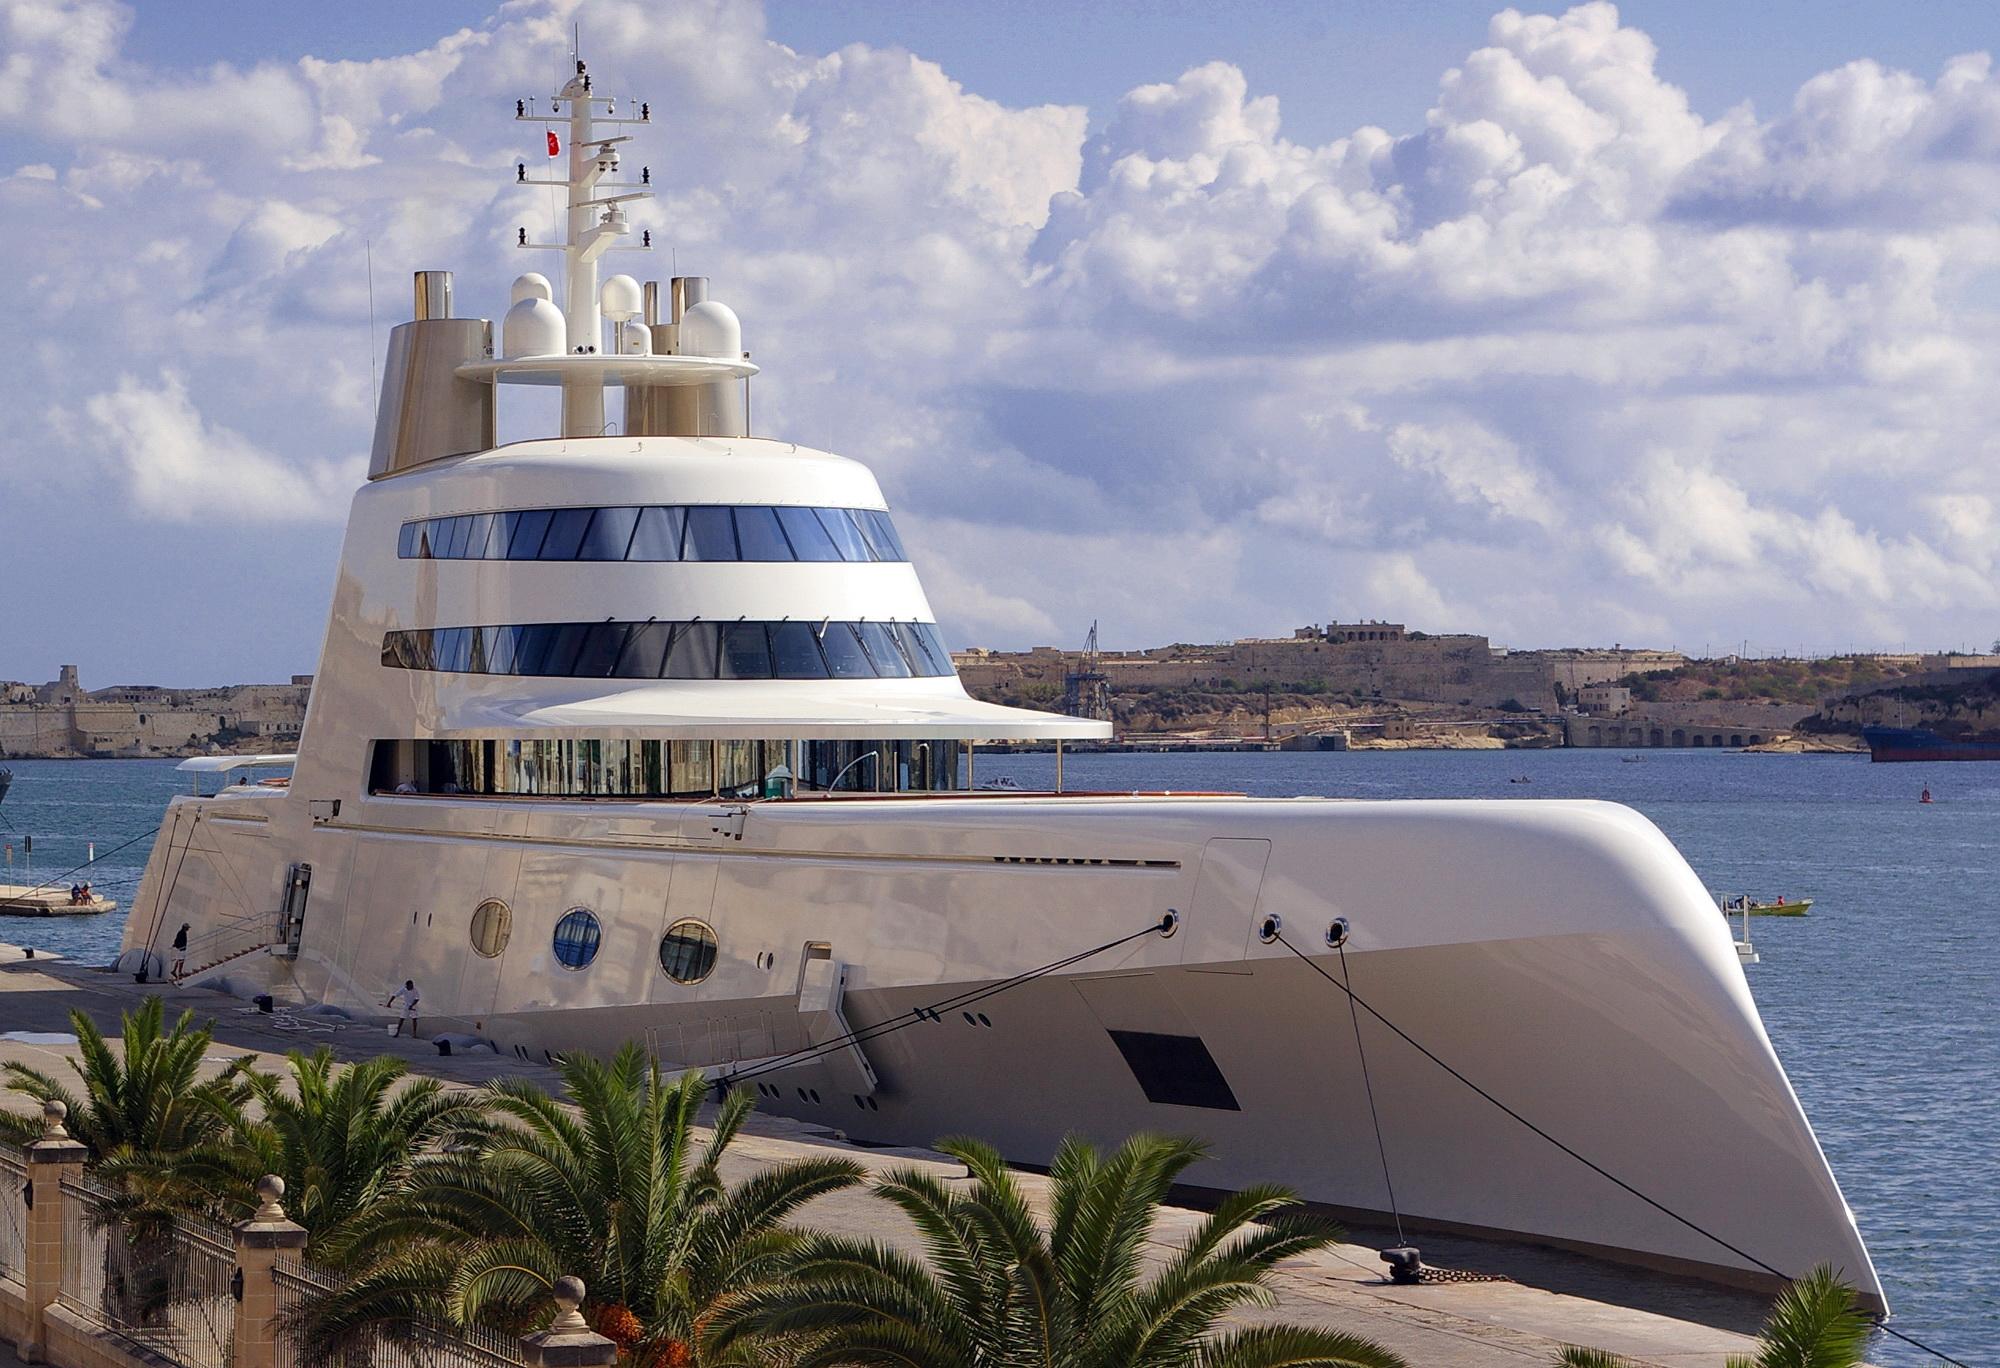 superyacht-a-docked